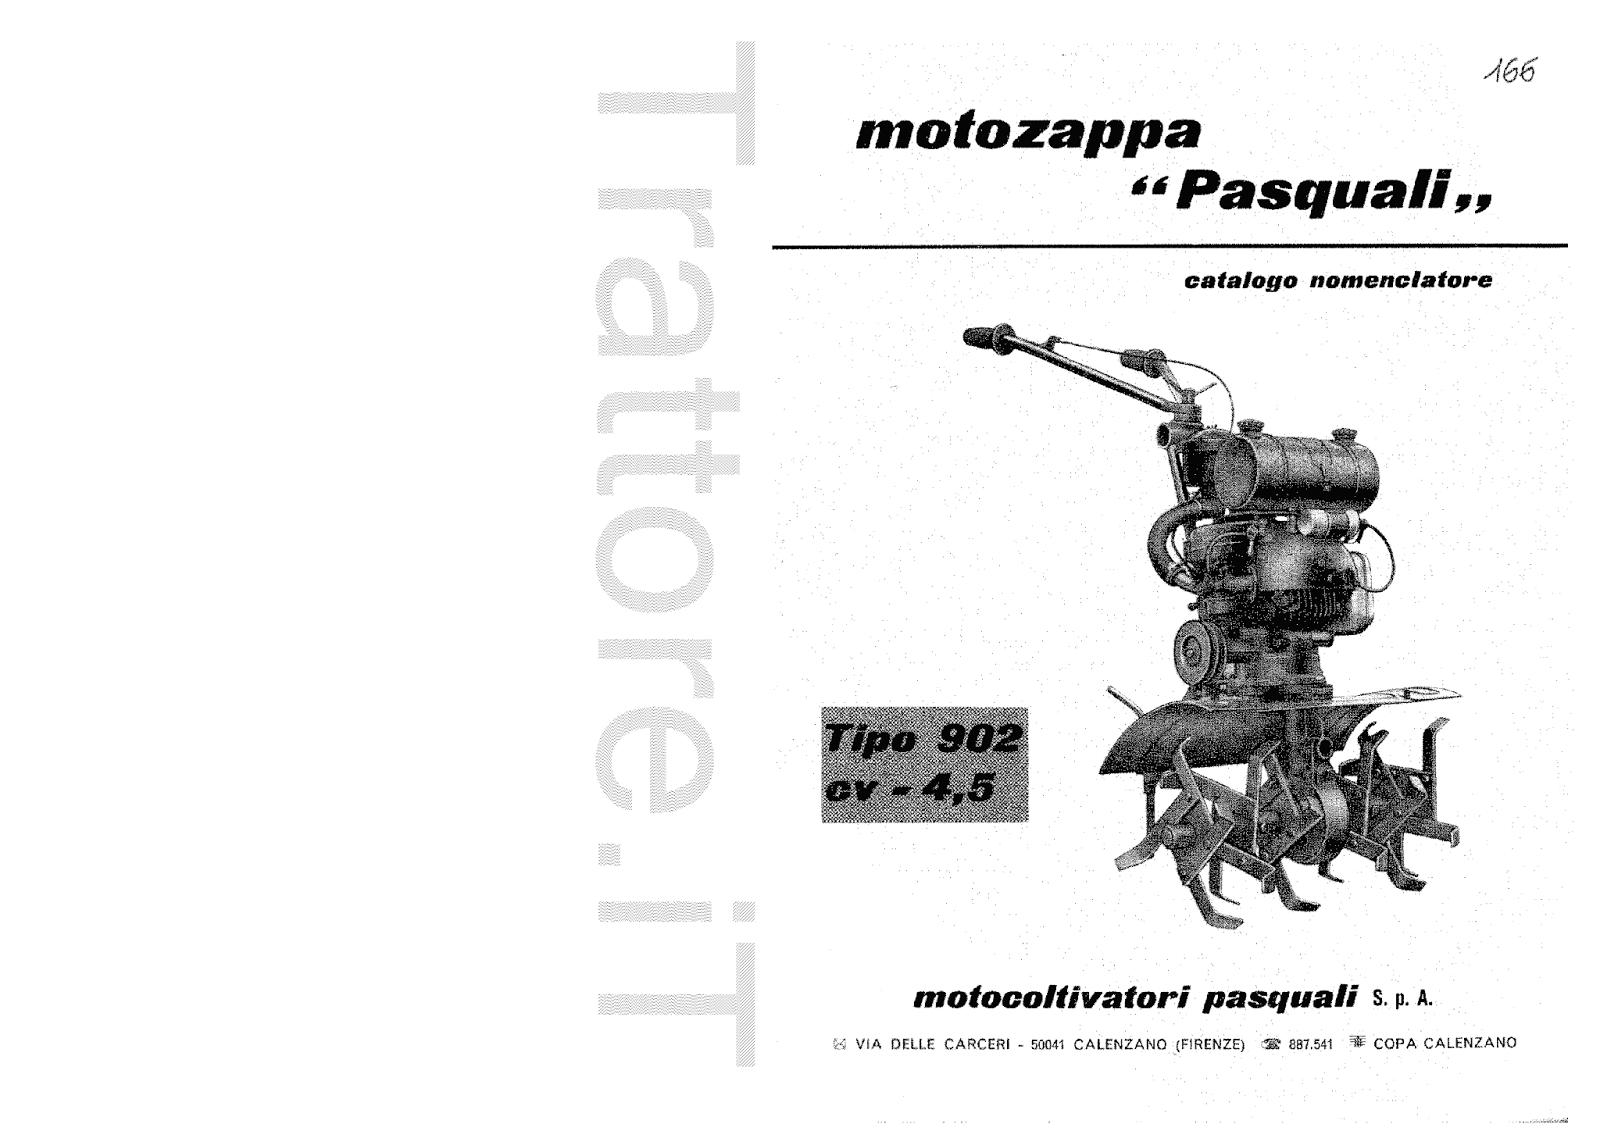 InfoTrattore.it: Motozappa Pasquali 902 CV 4.5 manuale